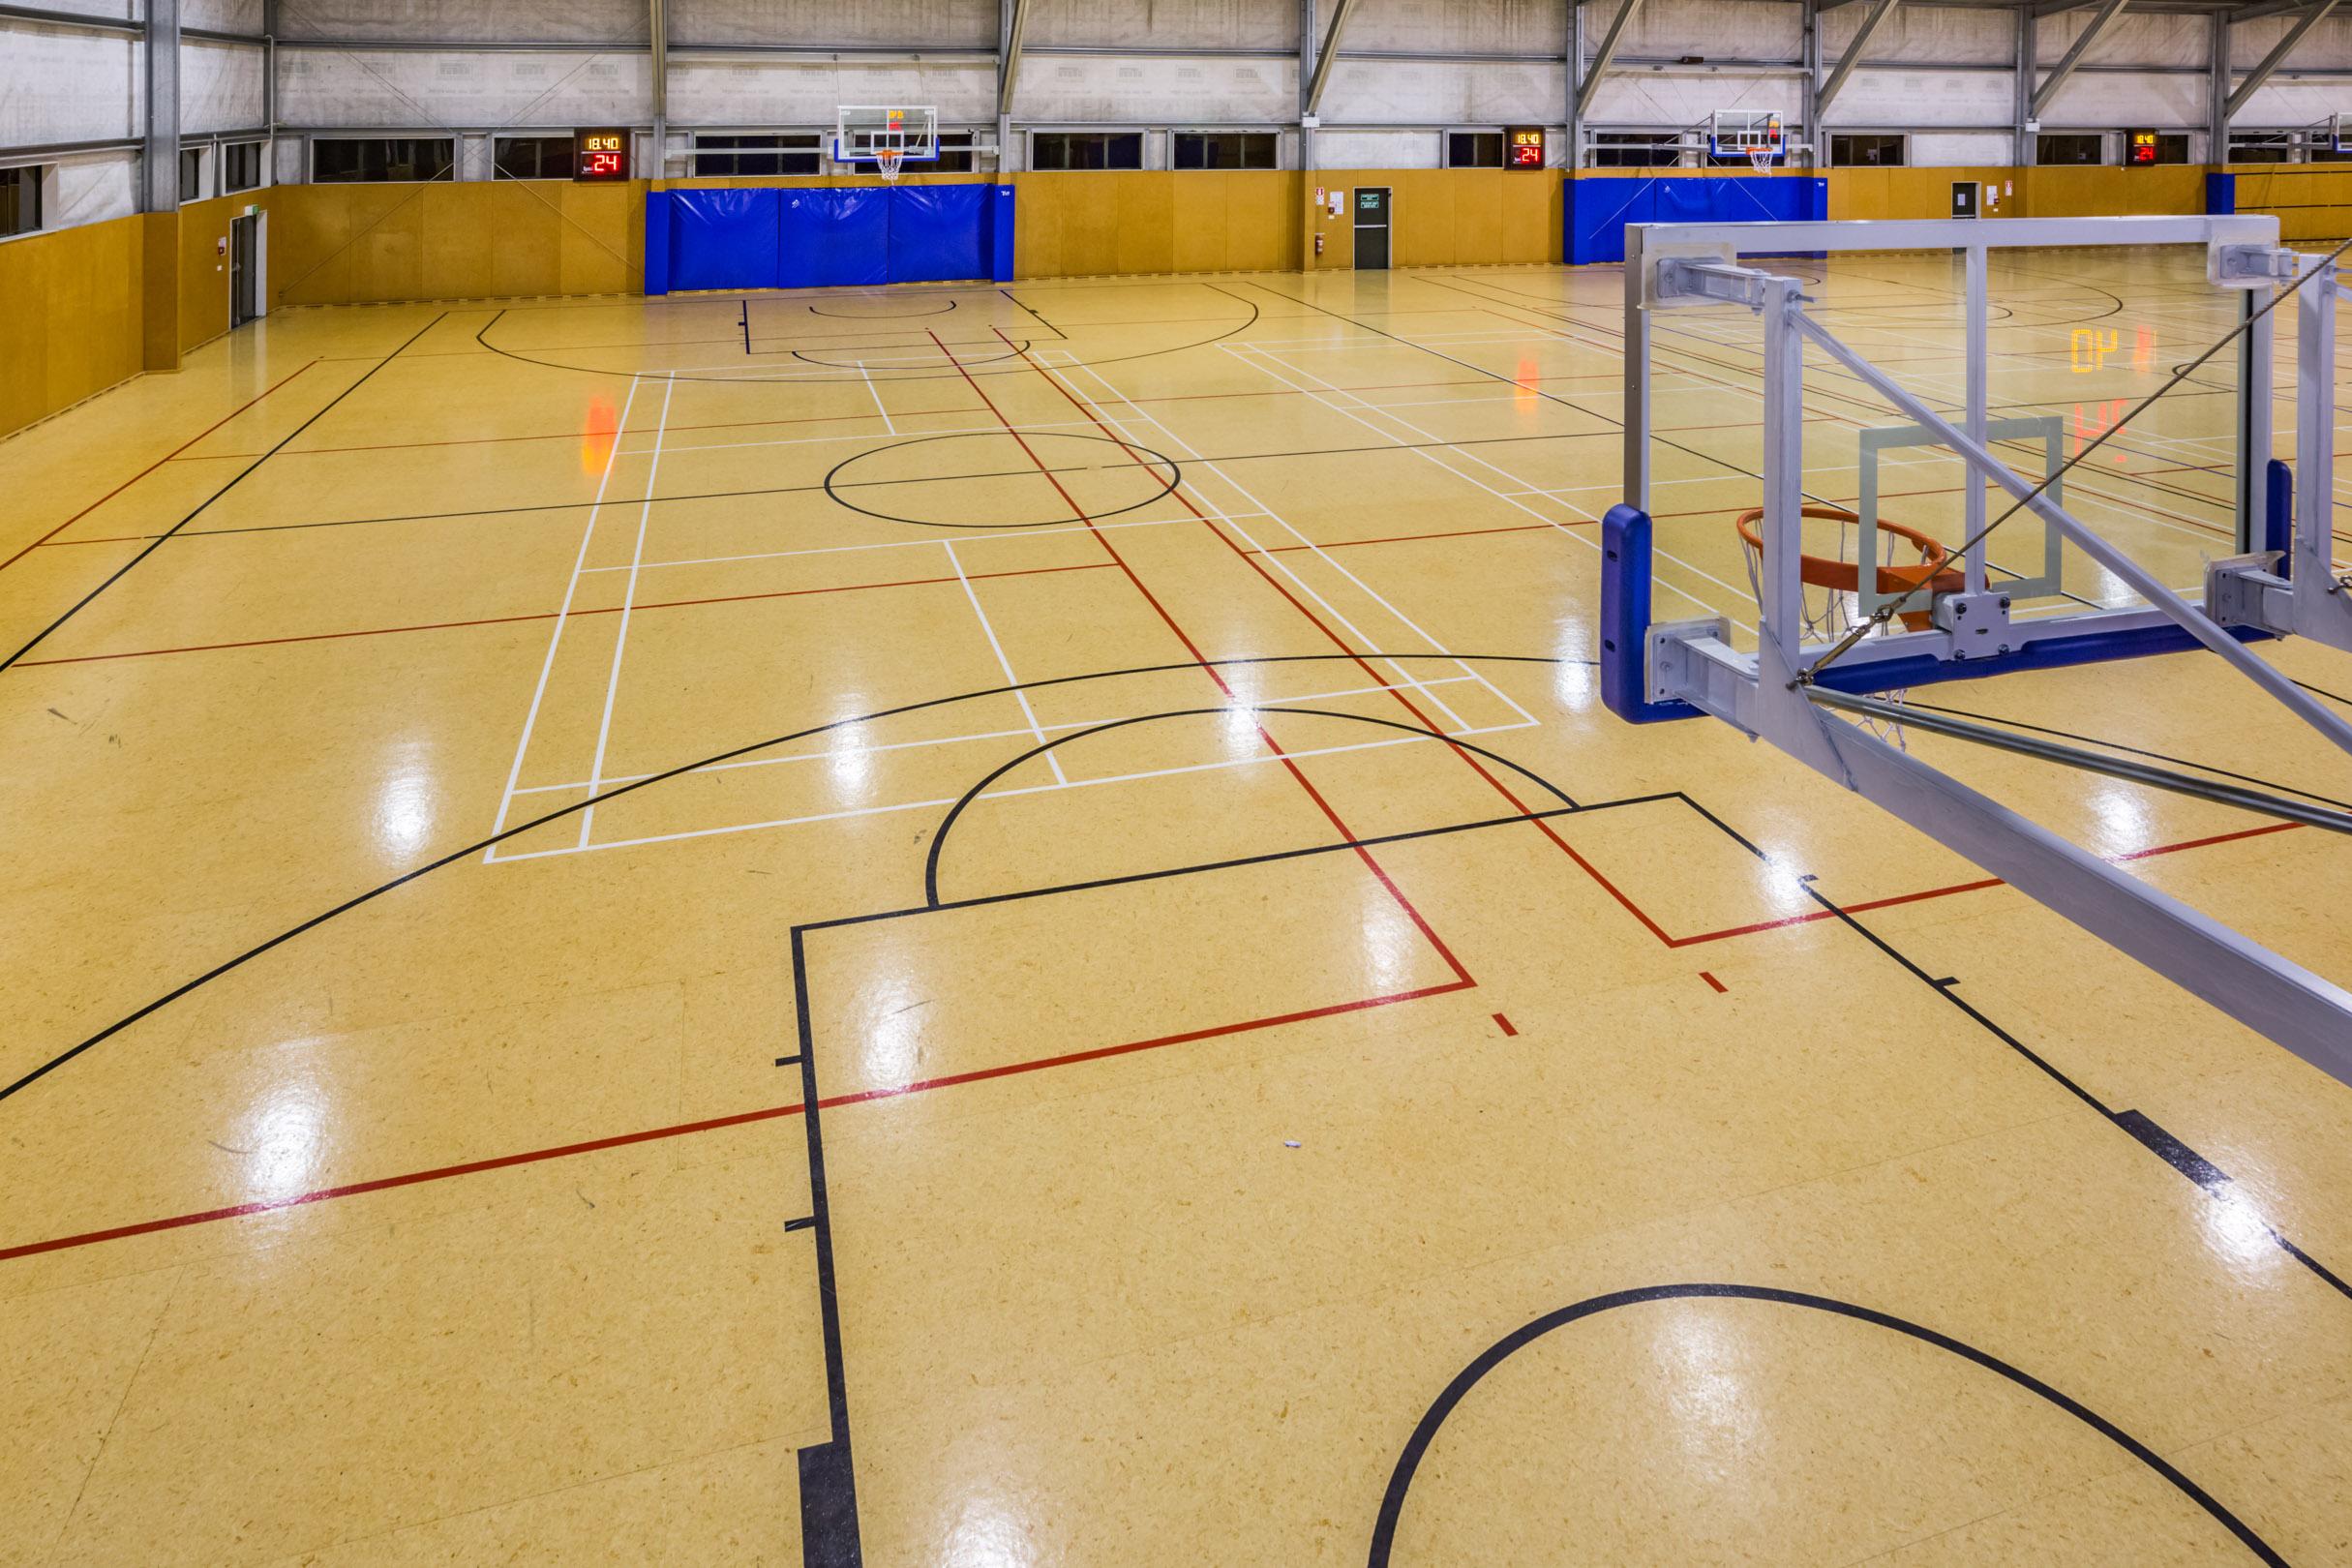 Tui Ridge Park Basketball Court